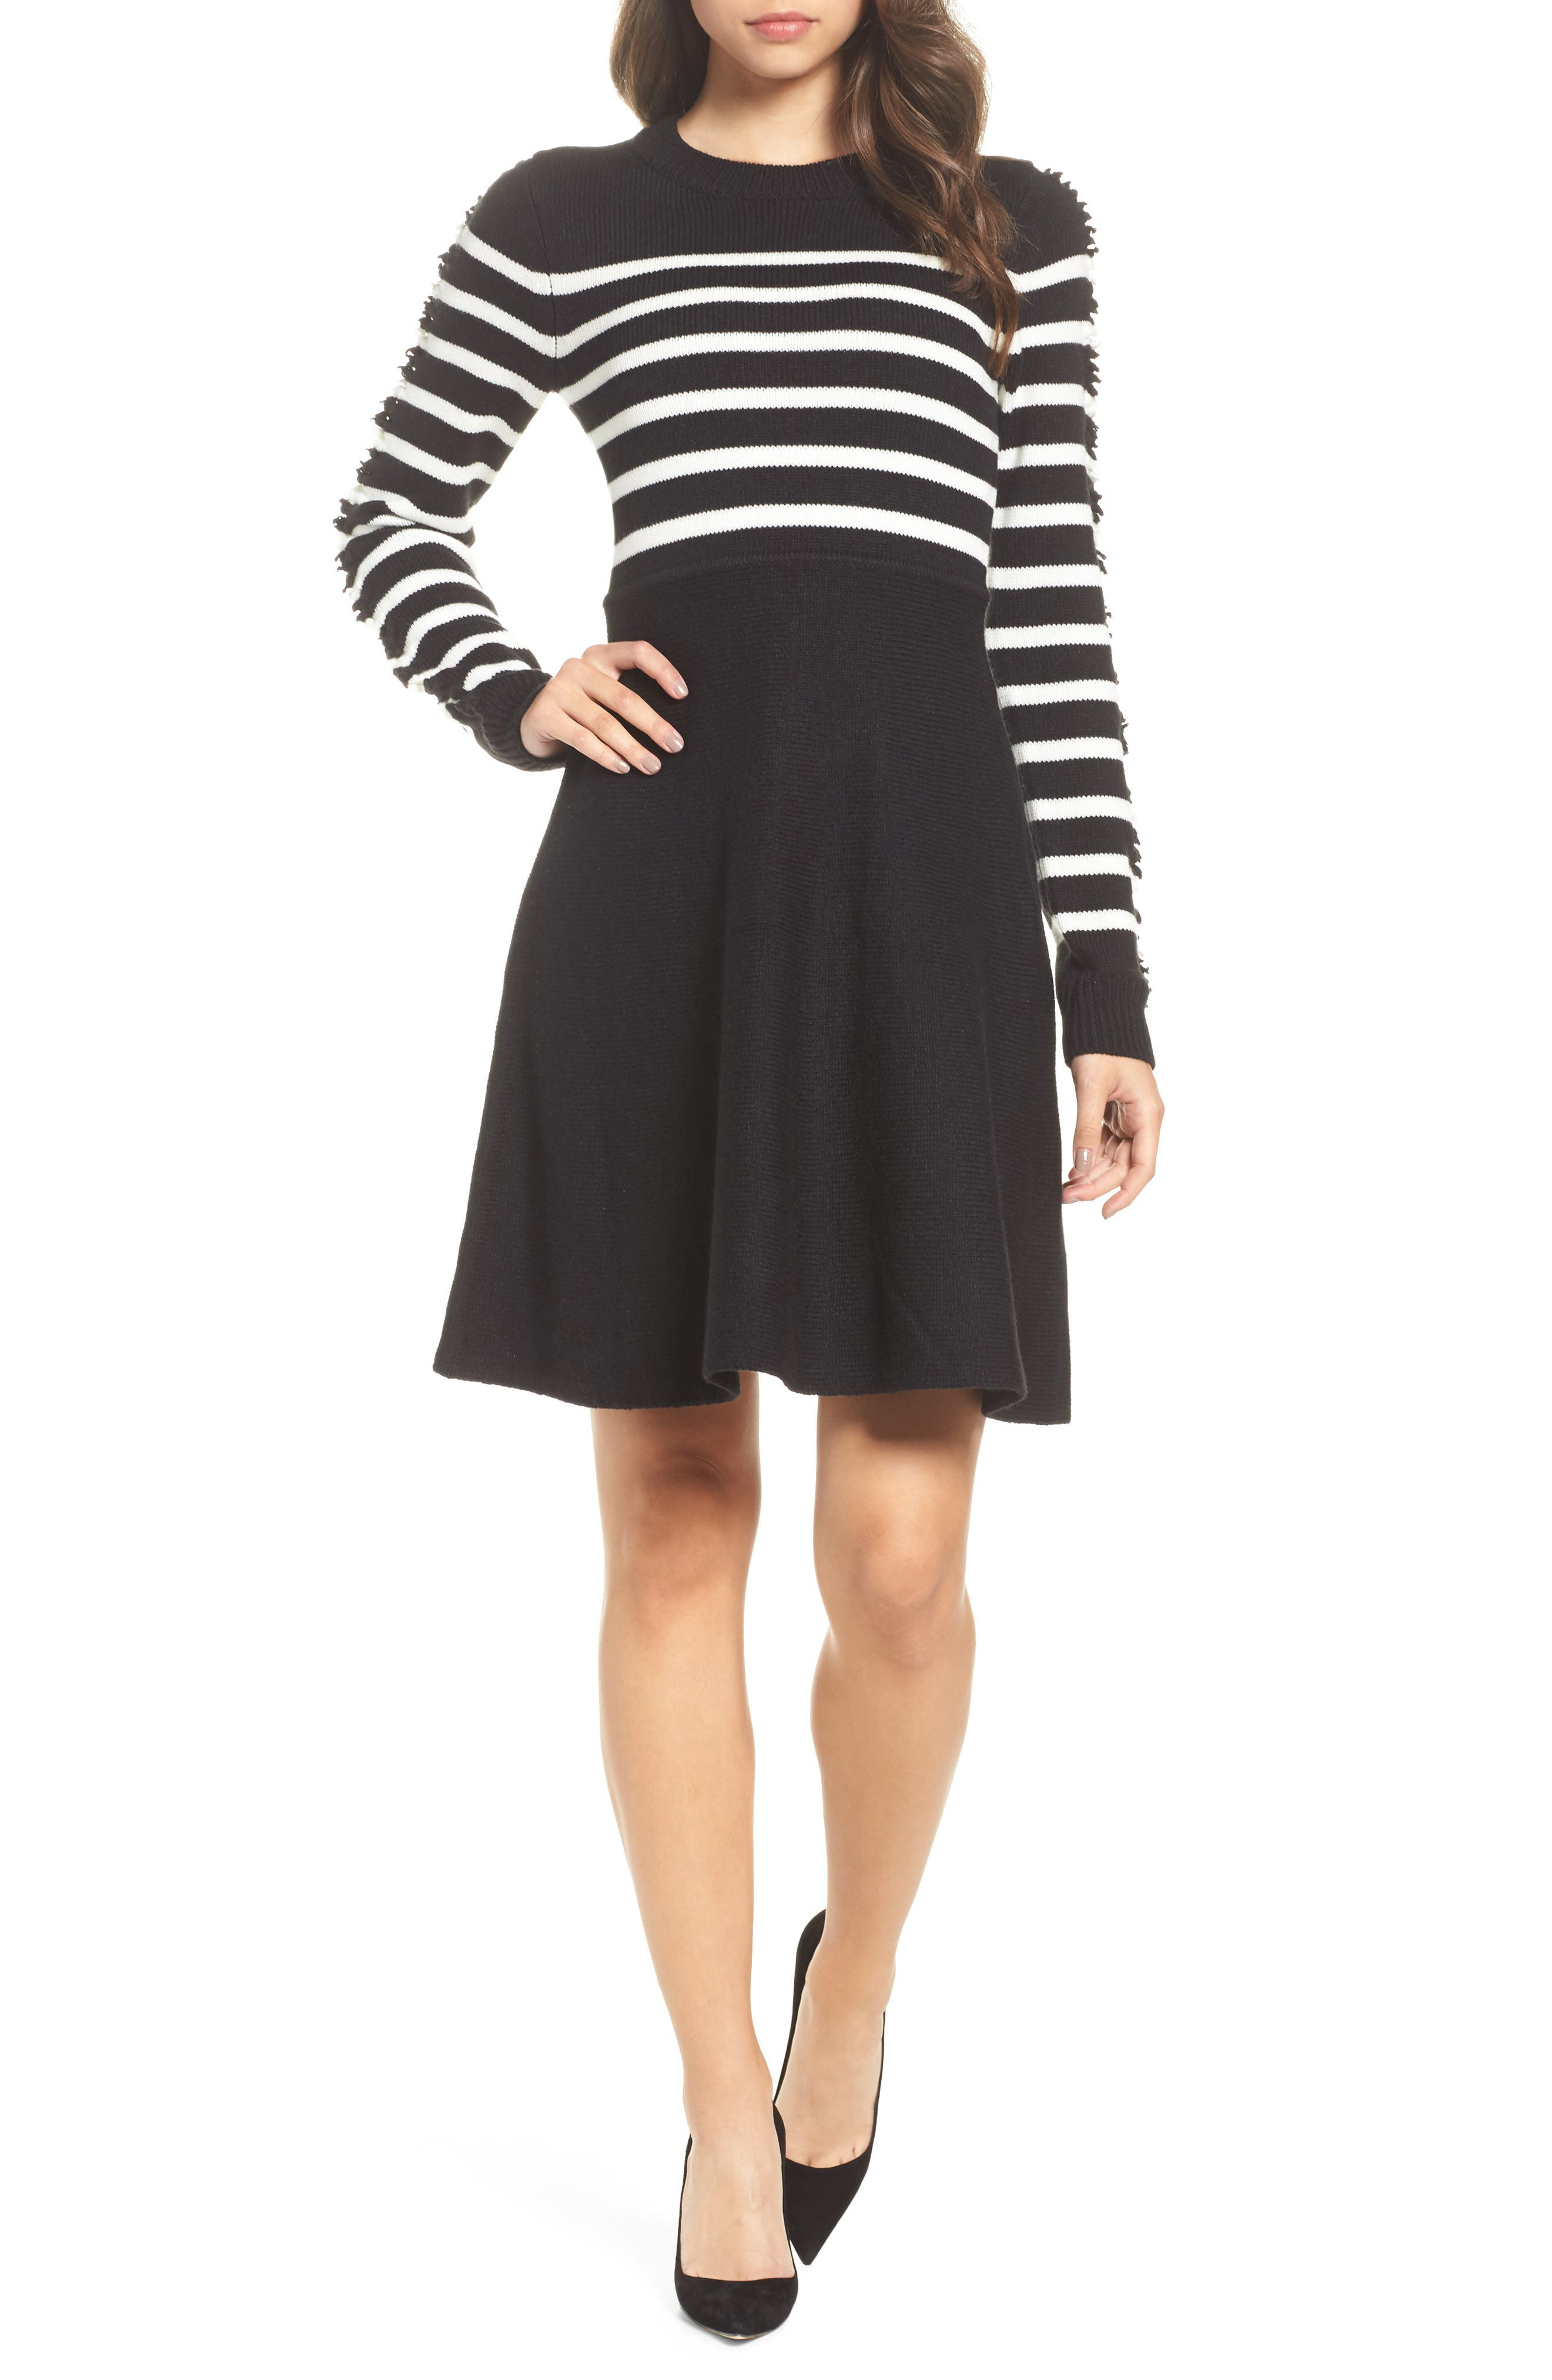 Alternate Image 1 Selected - Eliza J Fit & Flare Sweater Dress (Regular & Petite)